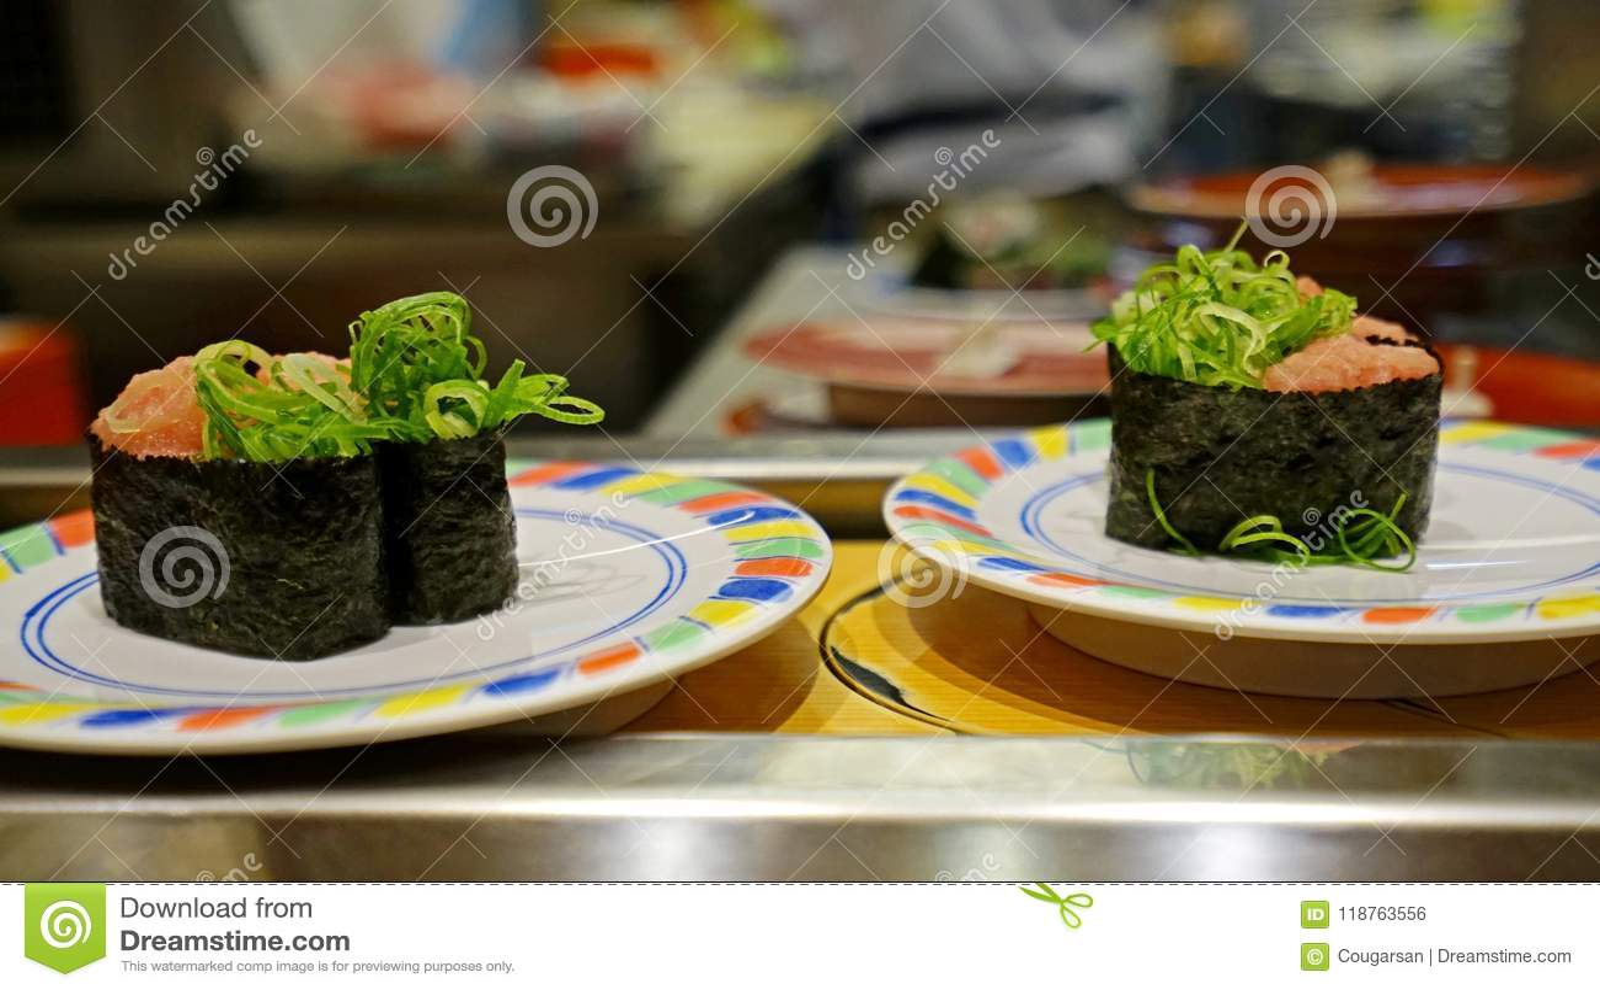 Nakaoch Gunkanmaki Sushi With Seaweed Paper In Japanese Restuarant